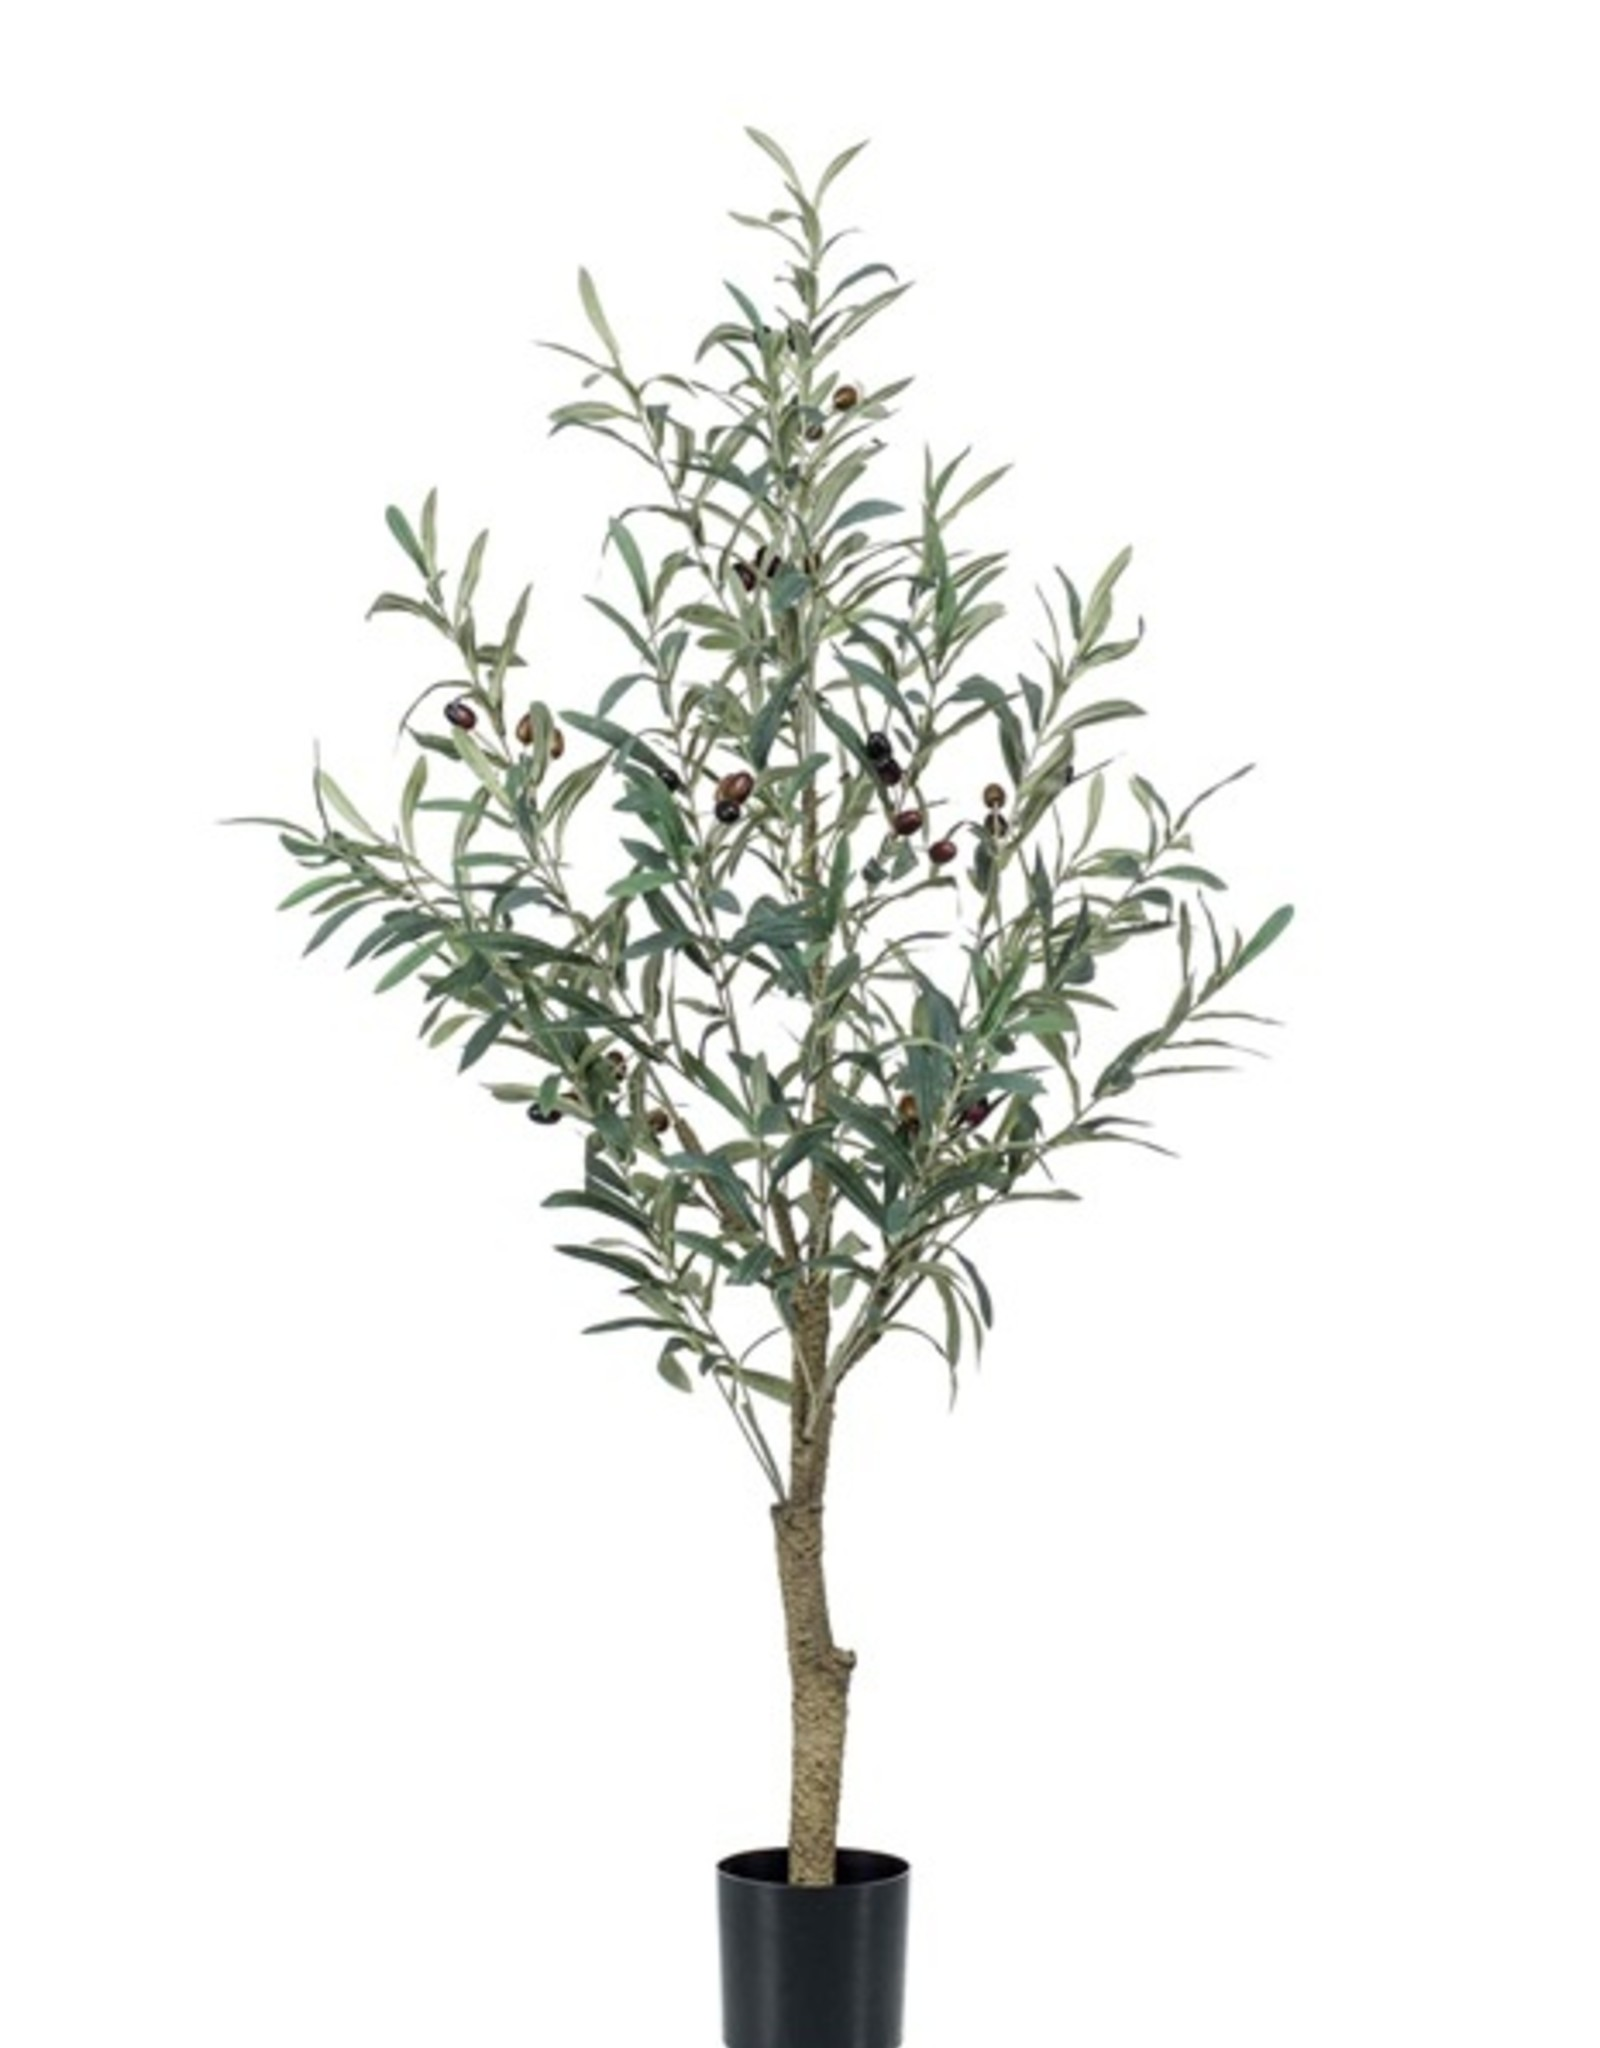 Emerald Eternal Green Olive tree 115cm in pot